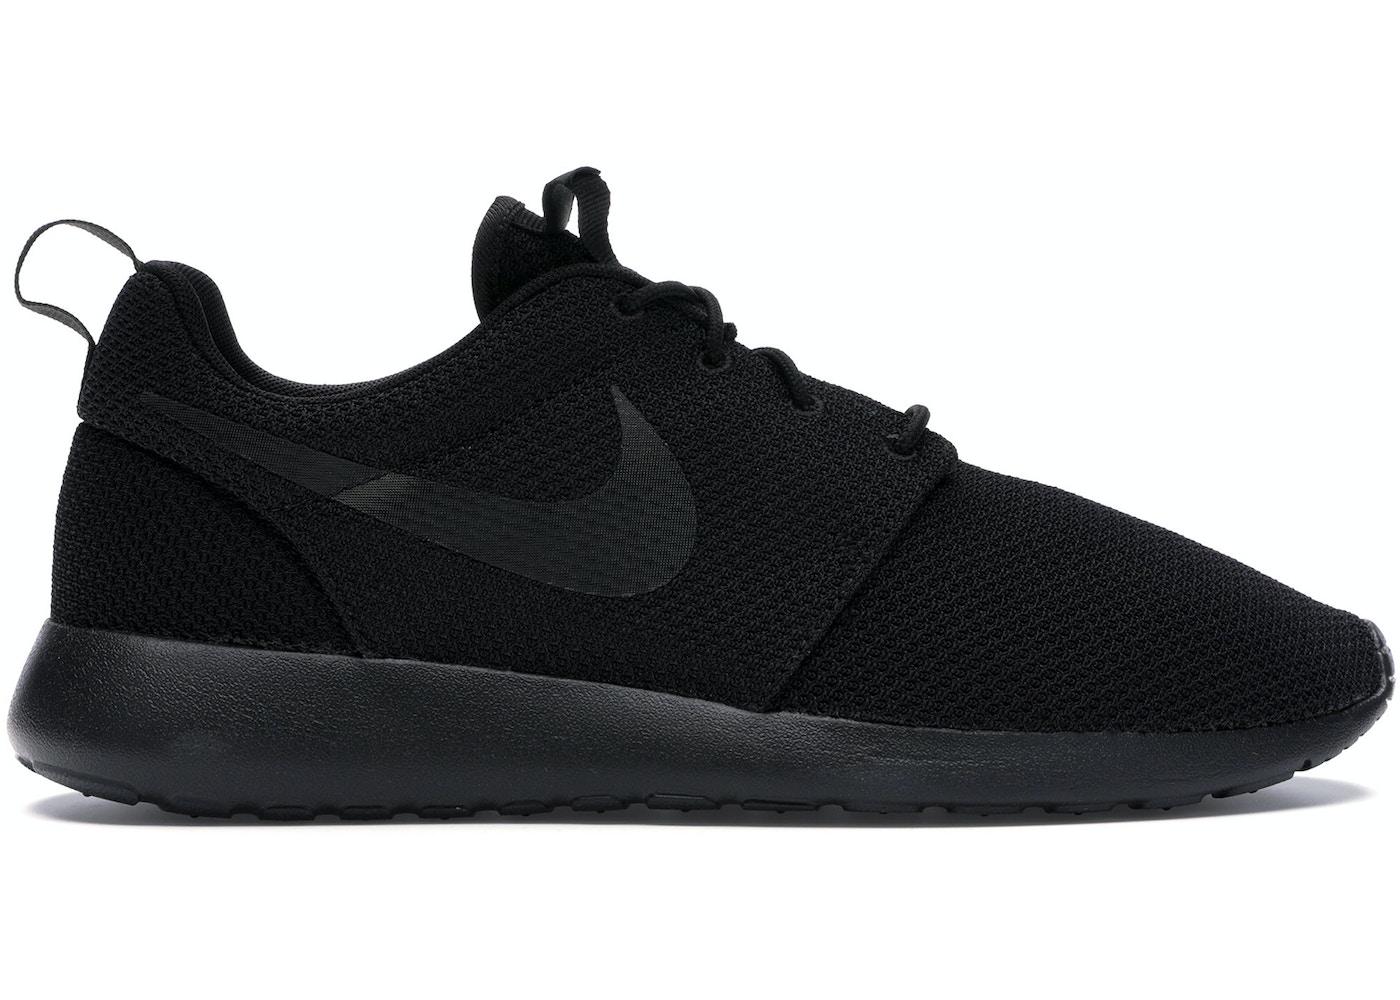 Oceano Enumerar objetivo  Nike Roshe Run Triple Black - 511881-026